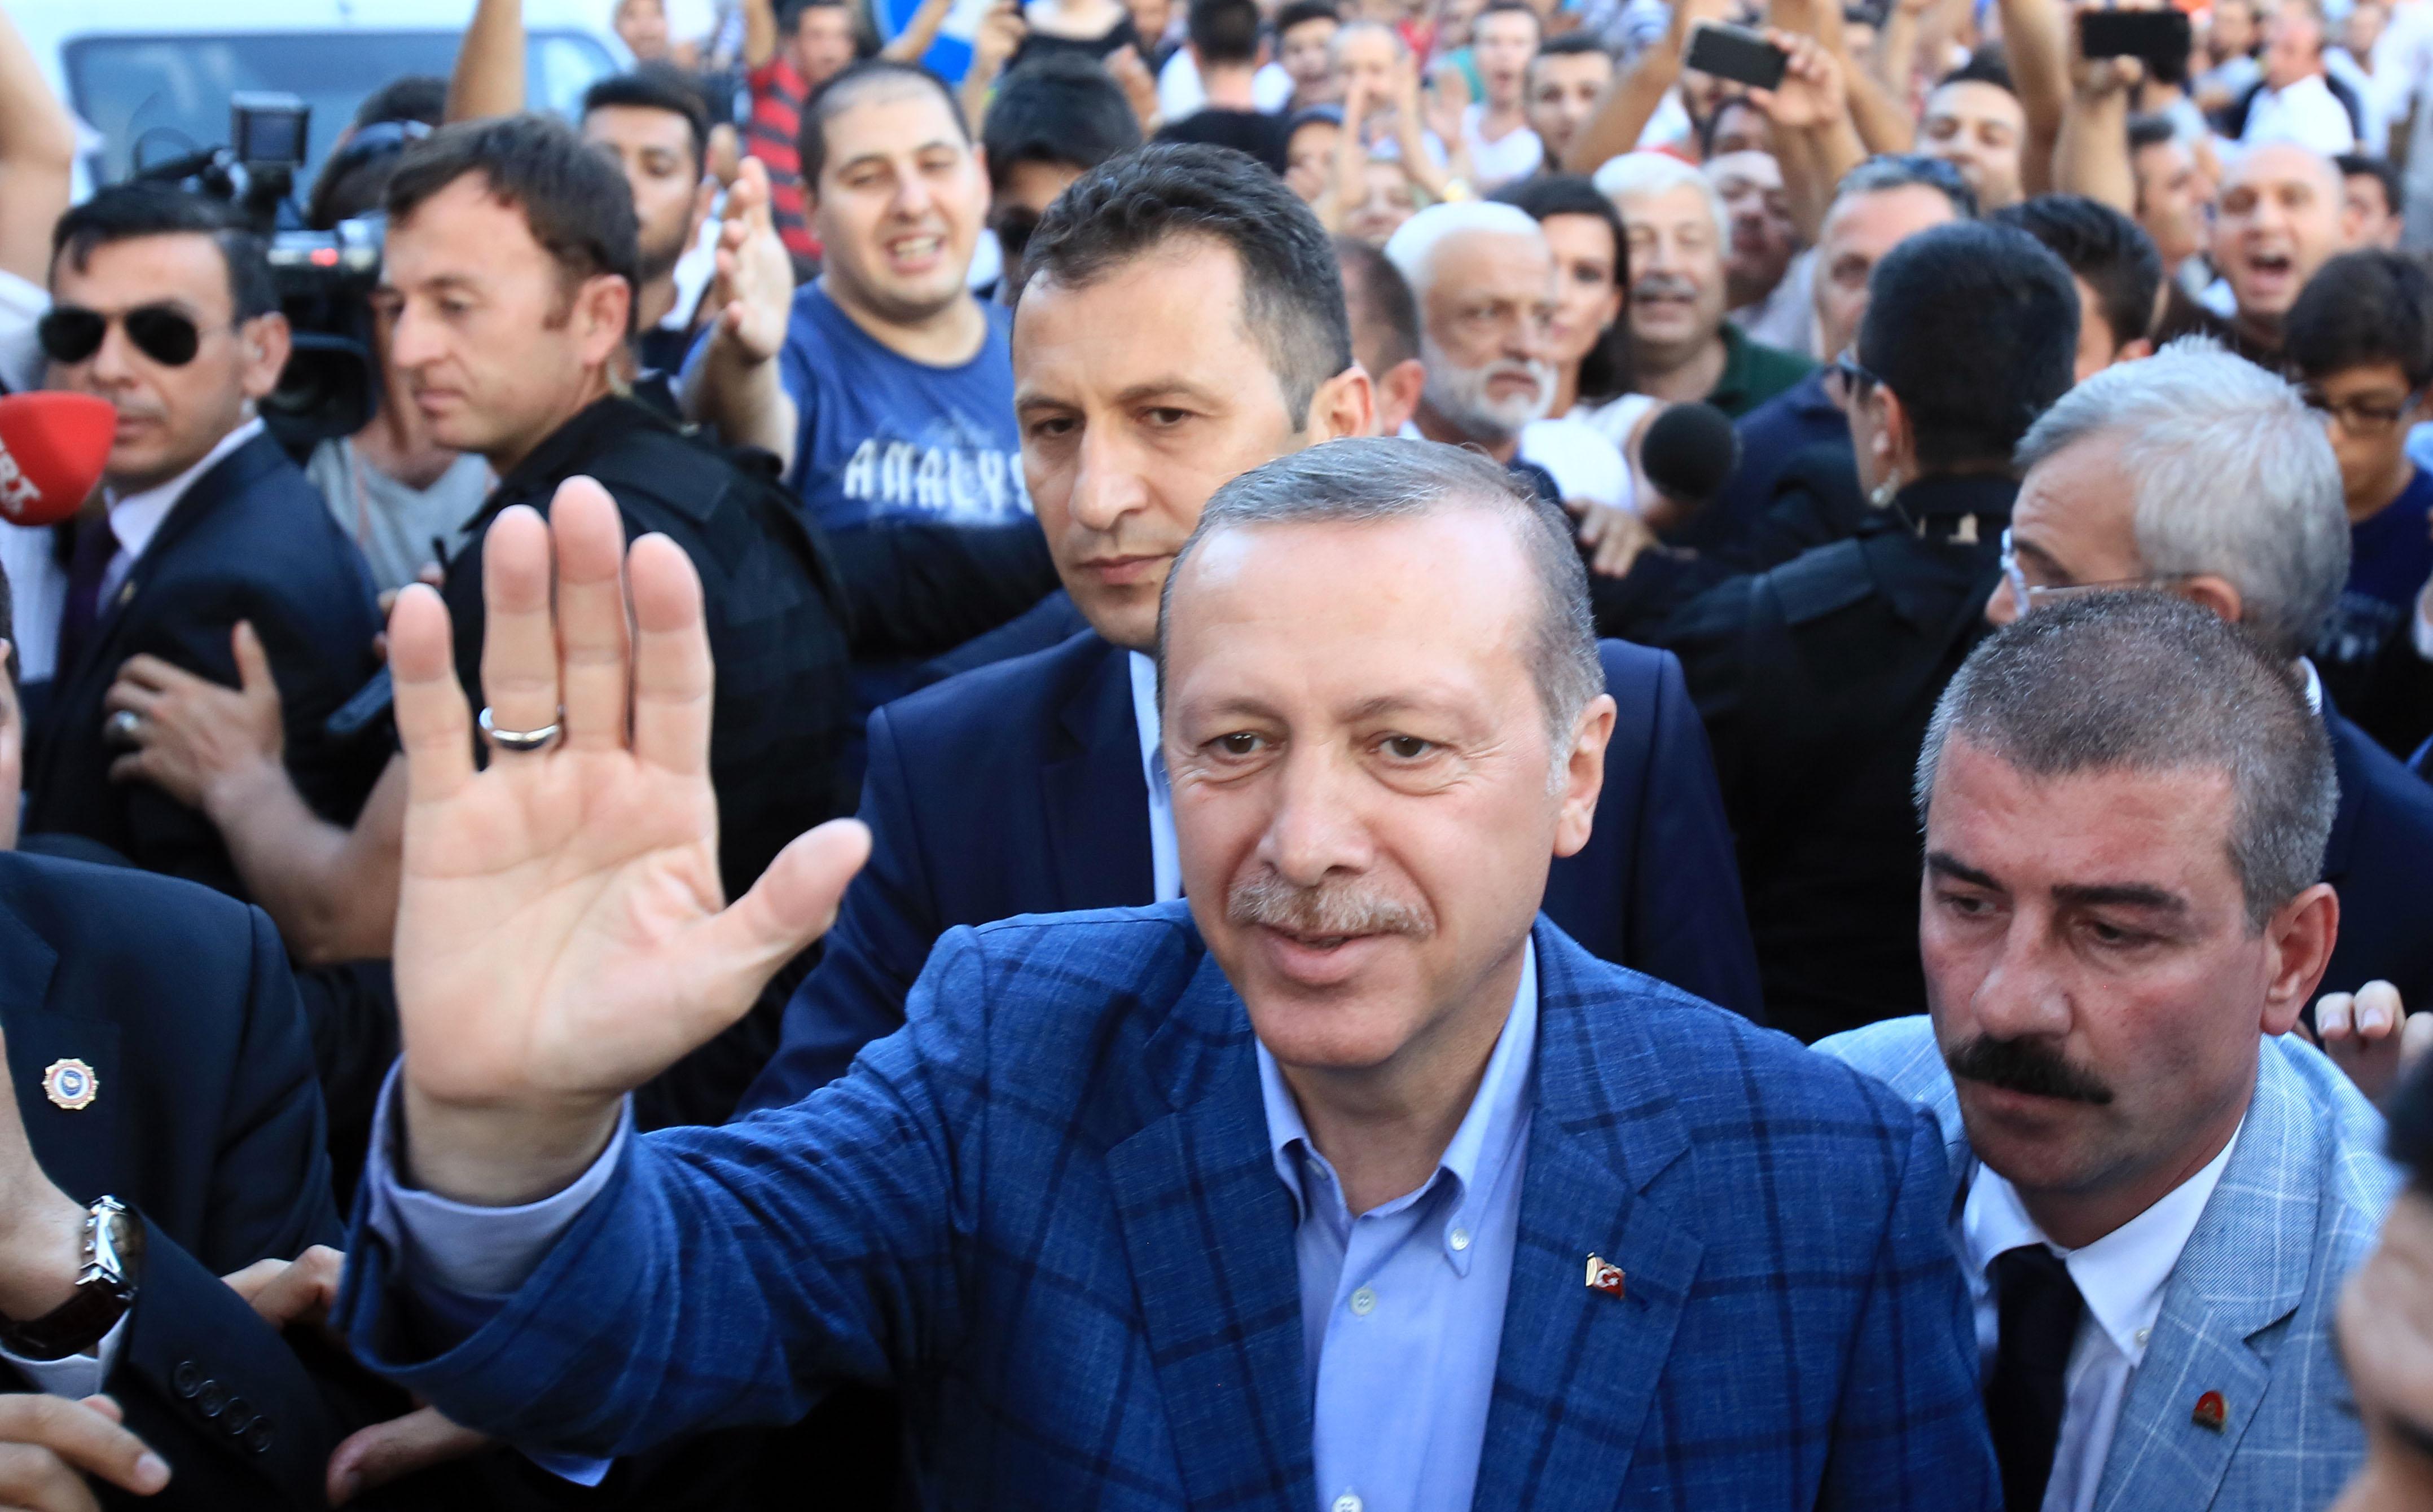 Winner of Turkey's presidential election Recep Tayyip Erdogan greets the public in Istanbul on Aug. 10, 2014